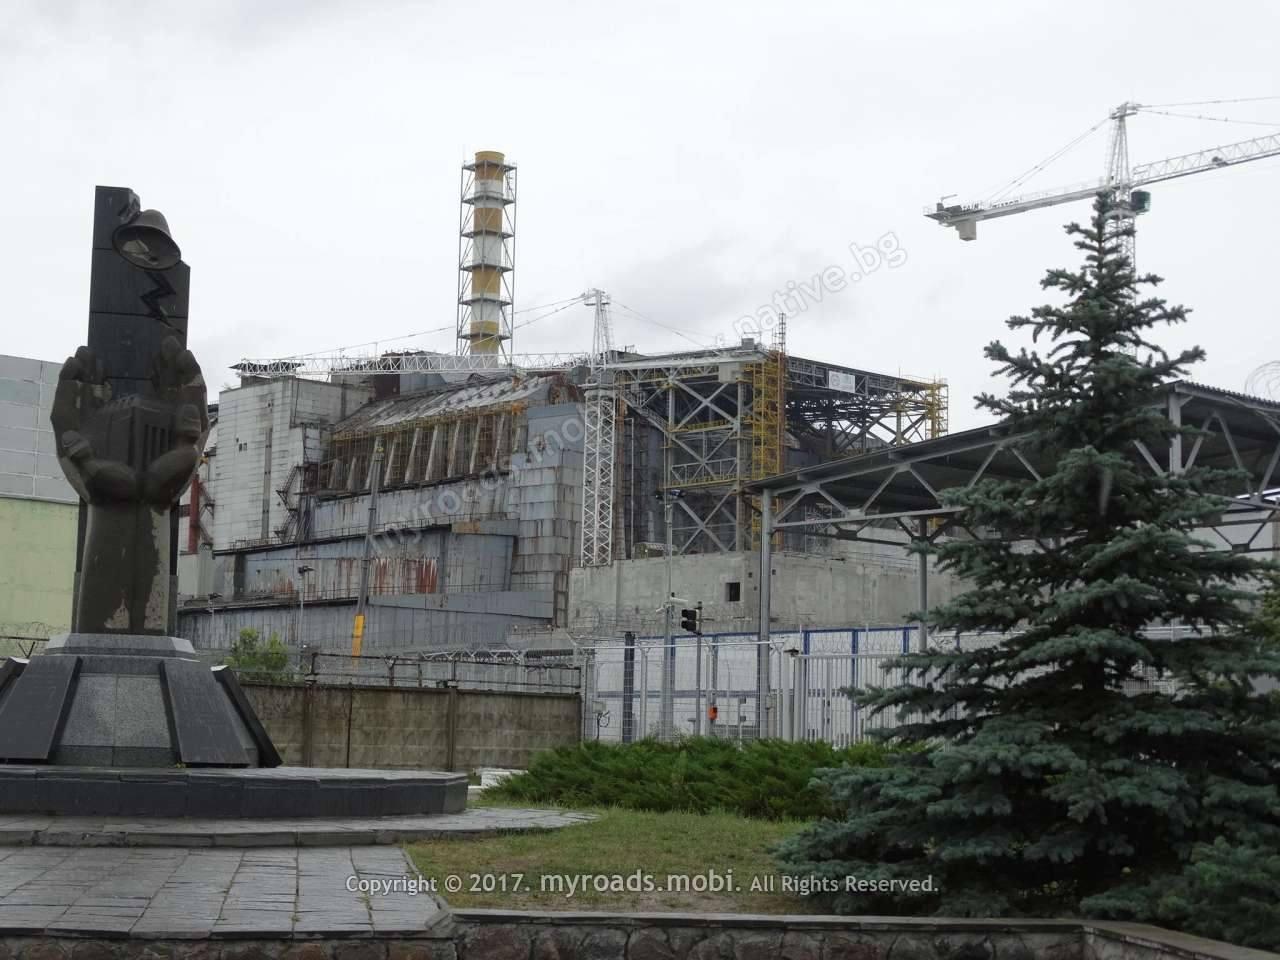 chernobil-pripyat-myroadsmobi-georgi-ivanov (17)